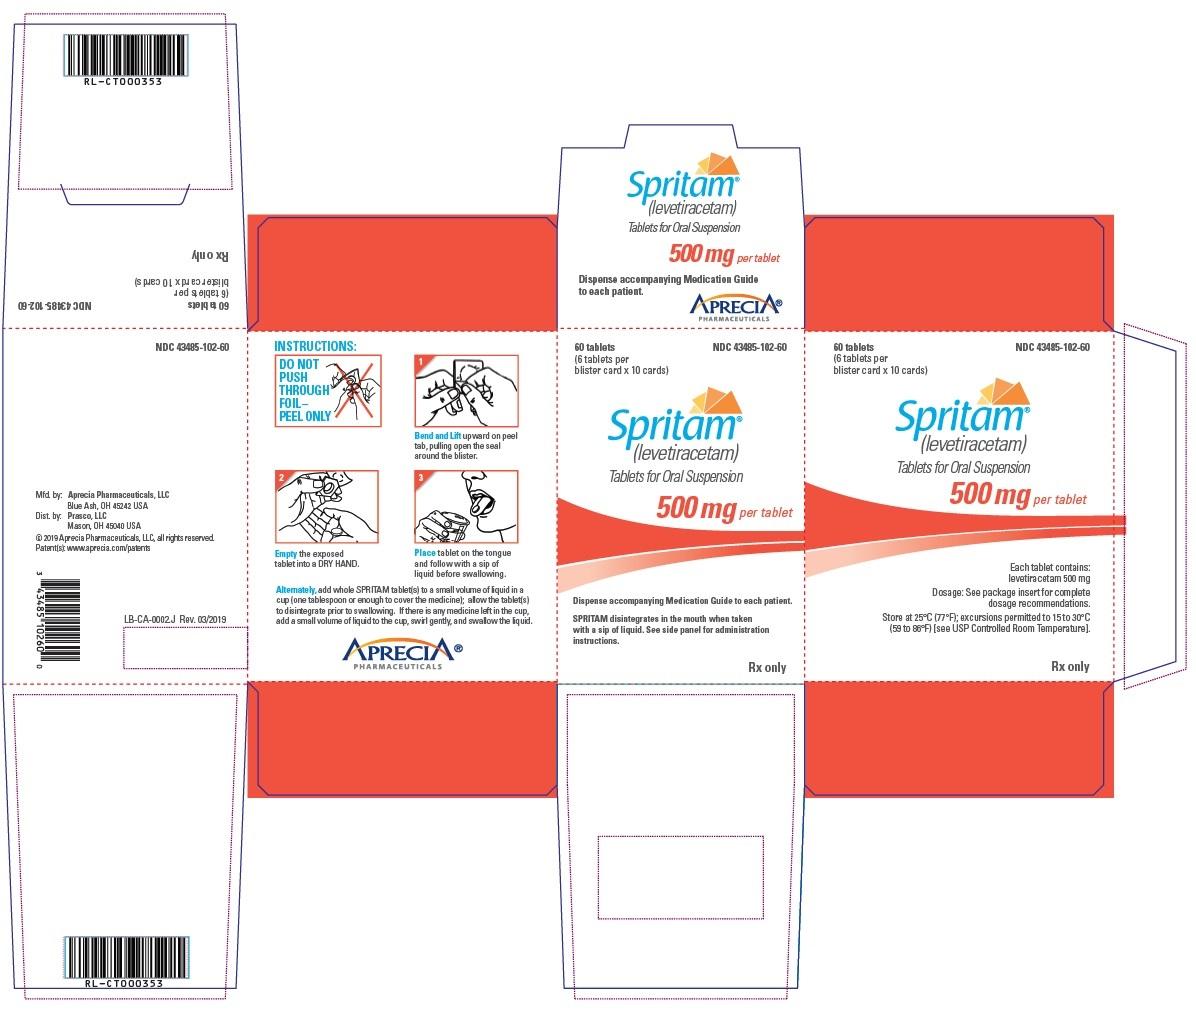 500 mg Carton Label